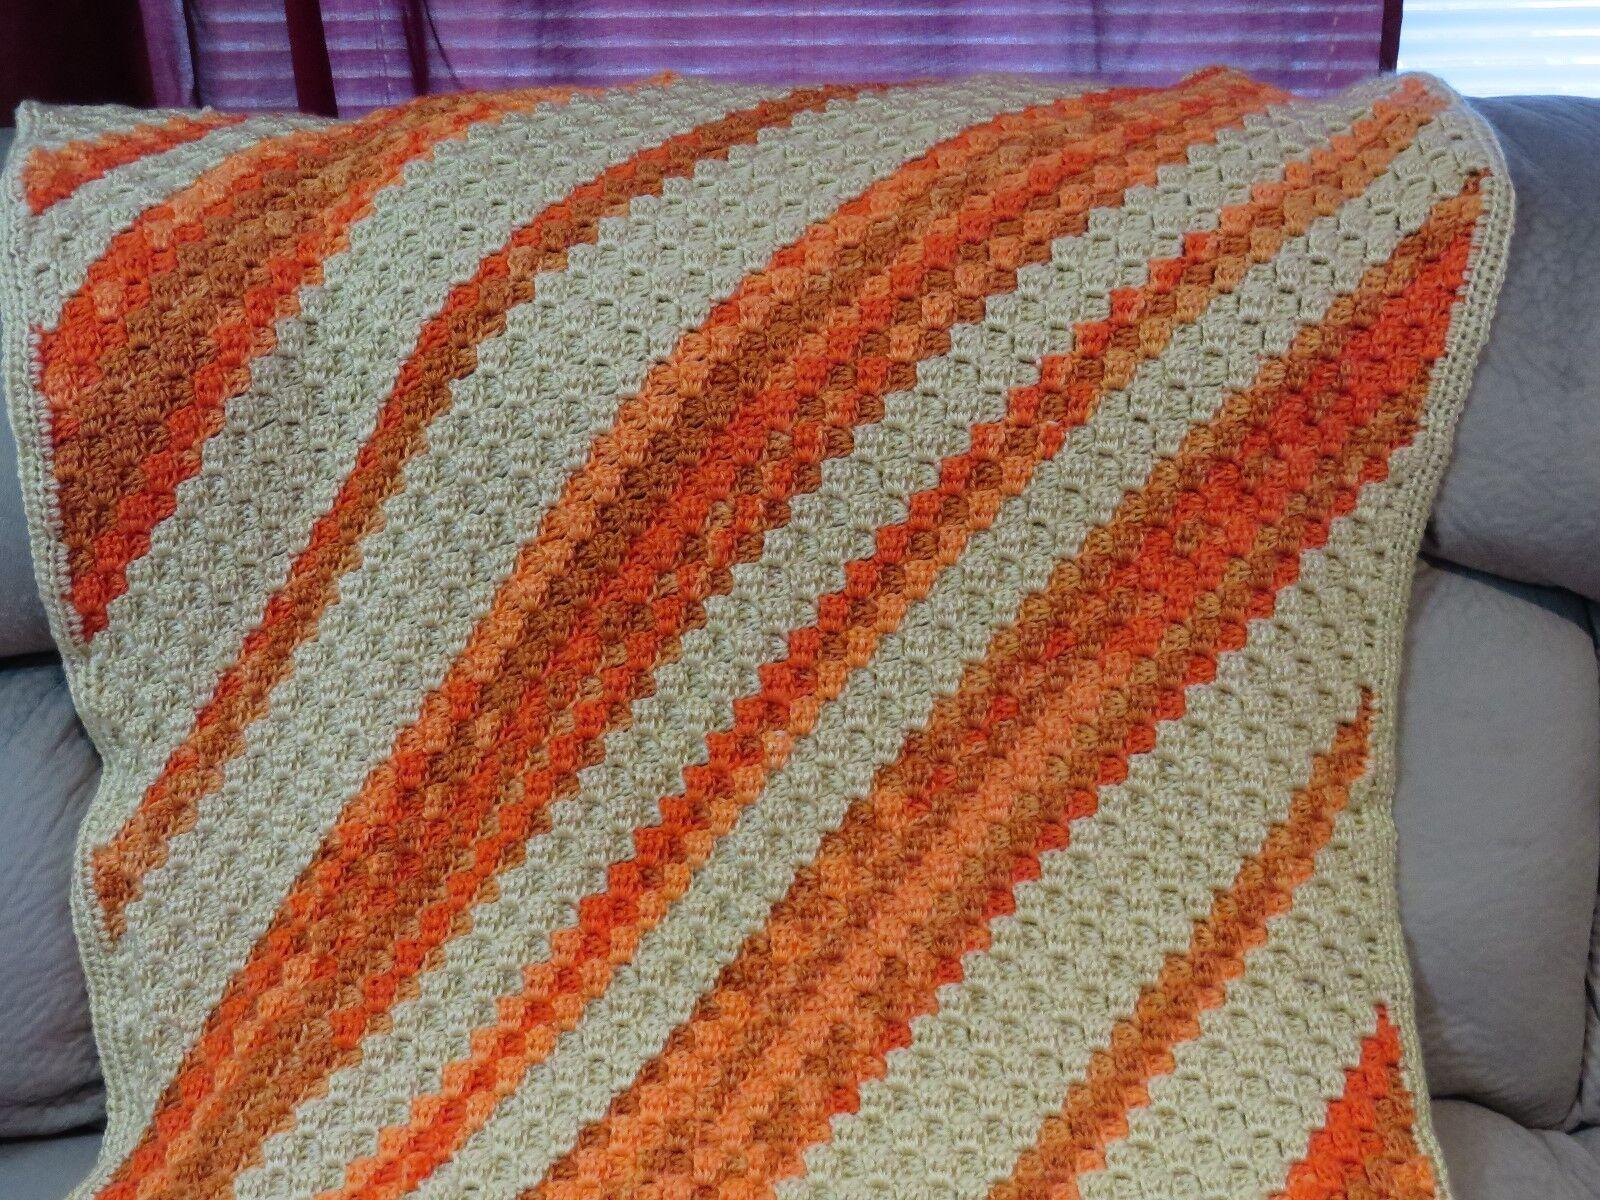 New  Handmade Crochet Blanket Throw Afghan - 40x55 - ivory, orange gold stripe